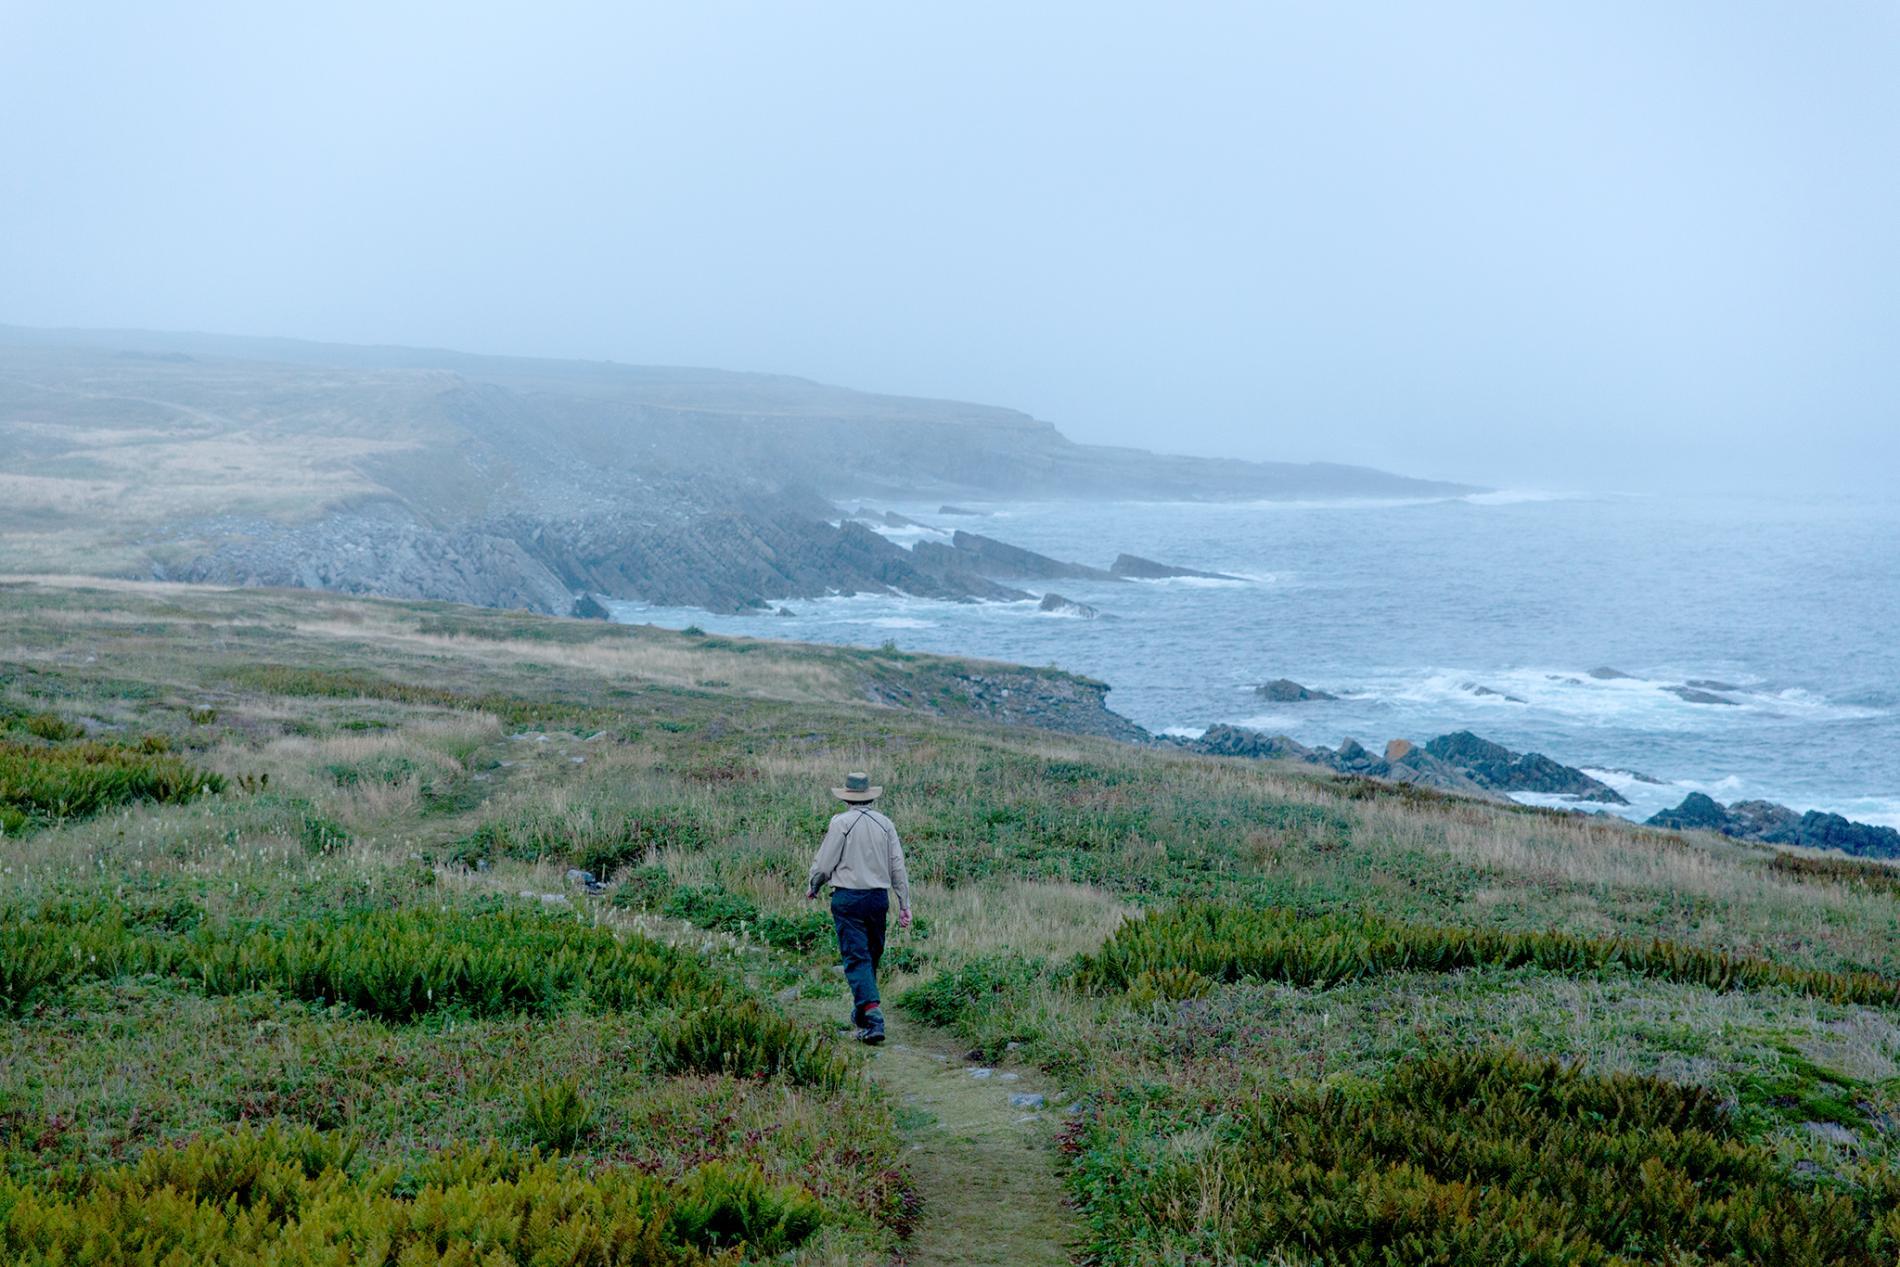 mistaken-point-ecological-reserve-newfoundland-canada.ngsversion.1508250618693.adapt.1900.1